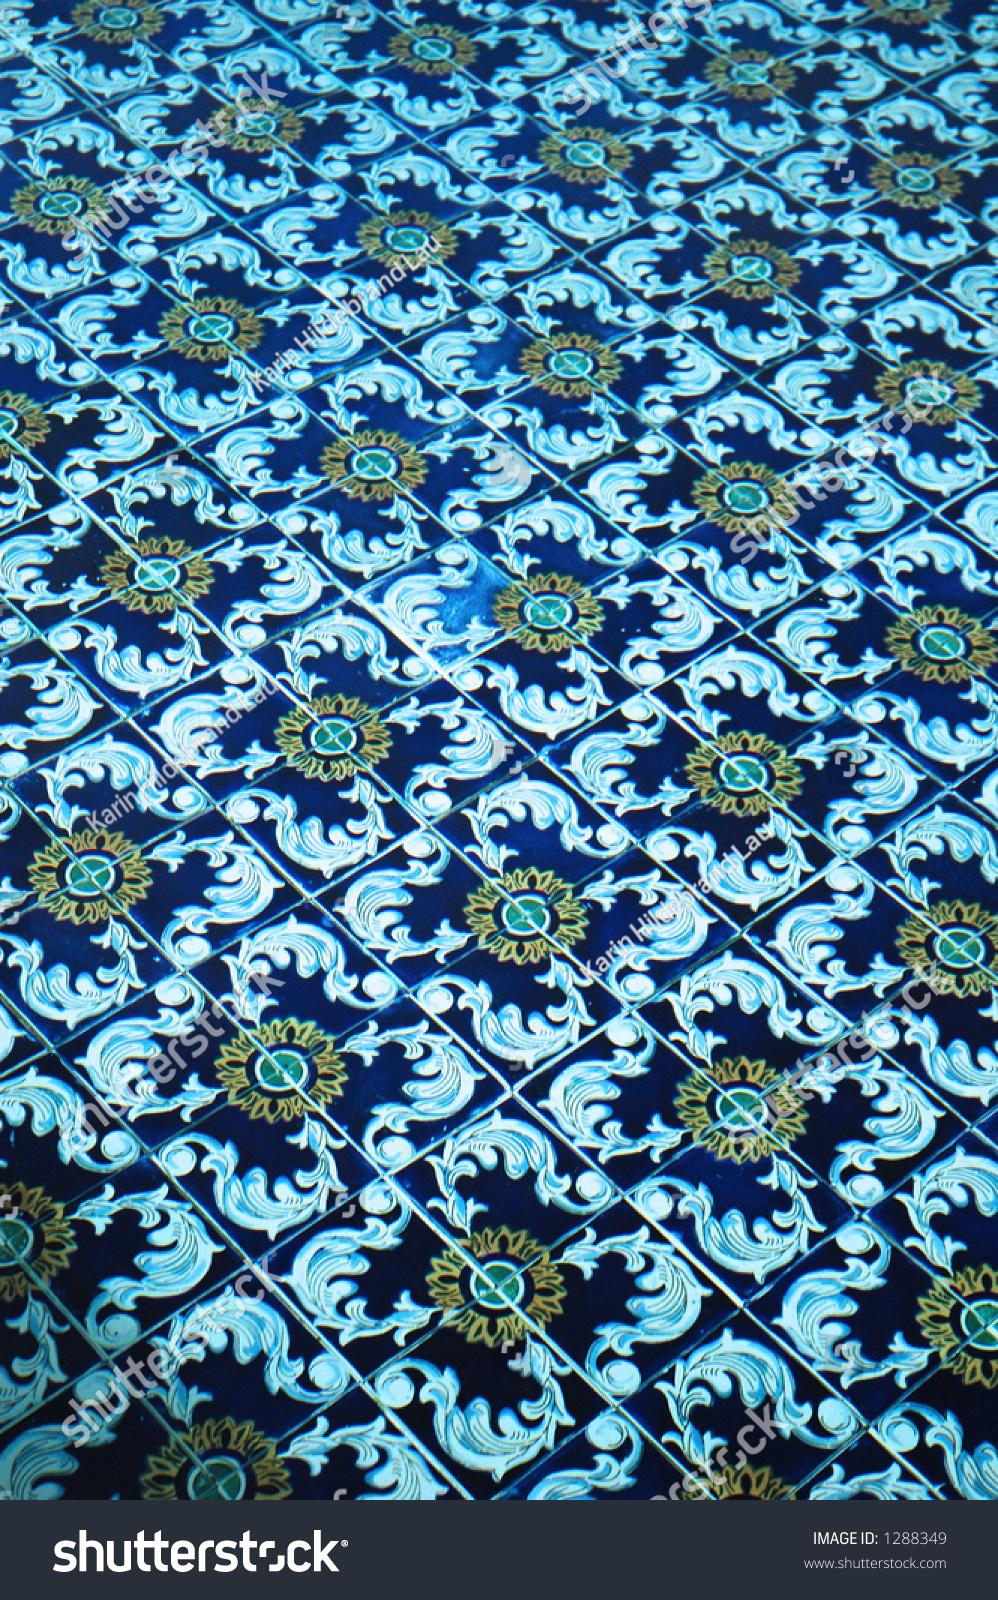 Spanish Tile Underwater Swimming Pool Stock Photo Edit Now 1288349